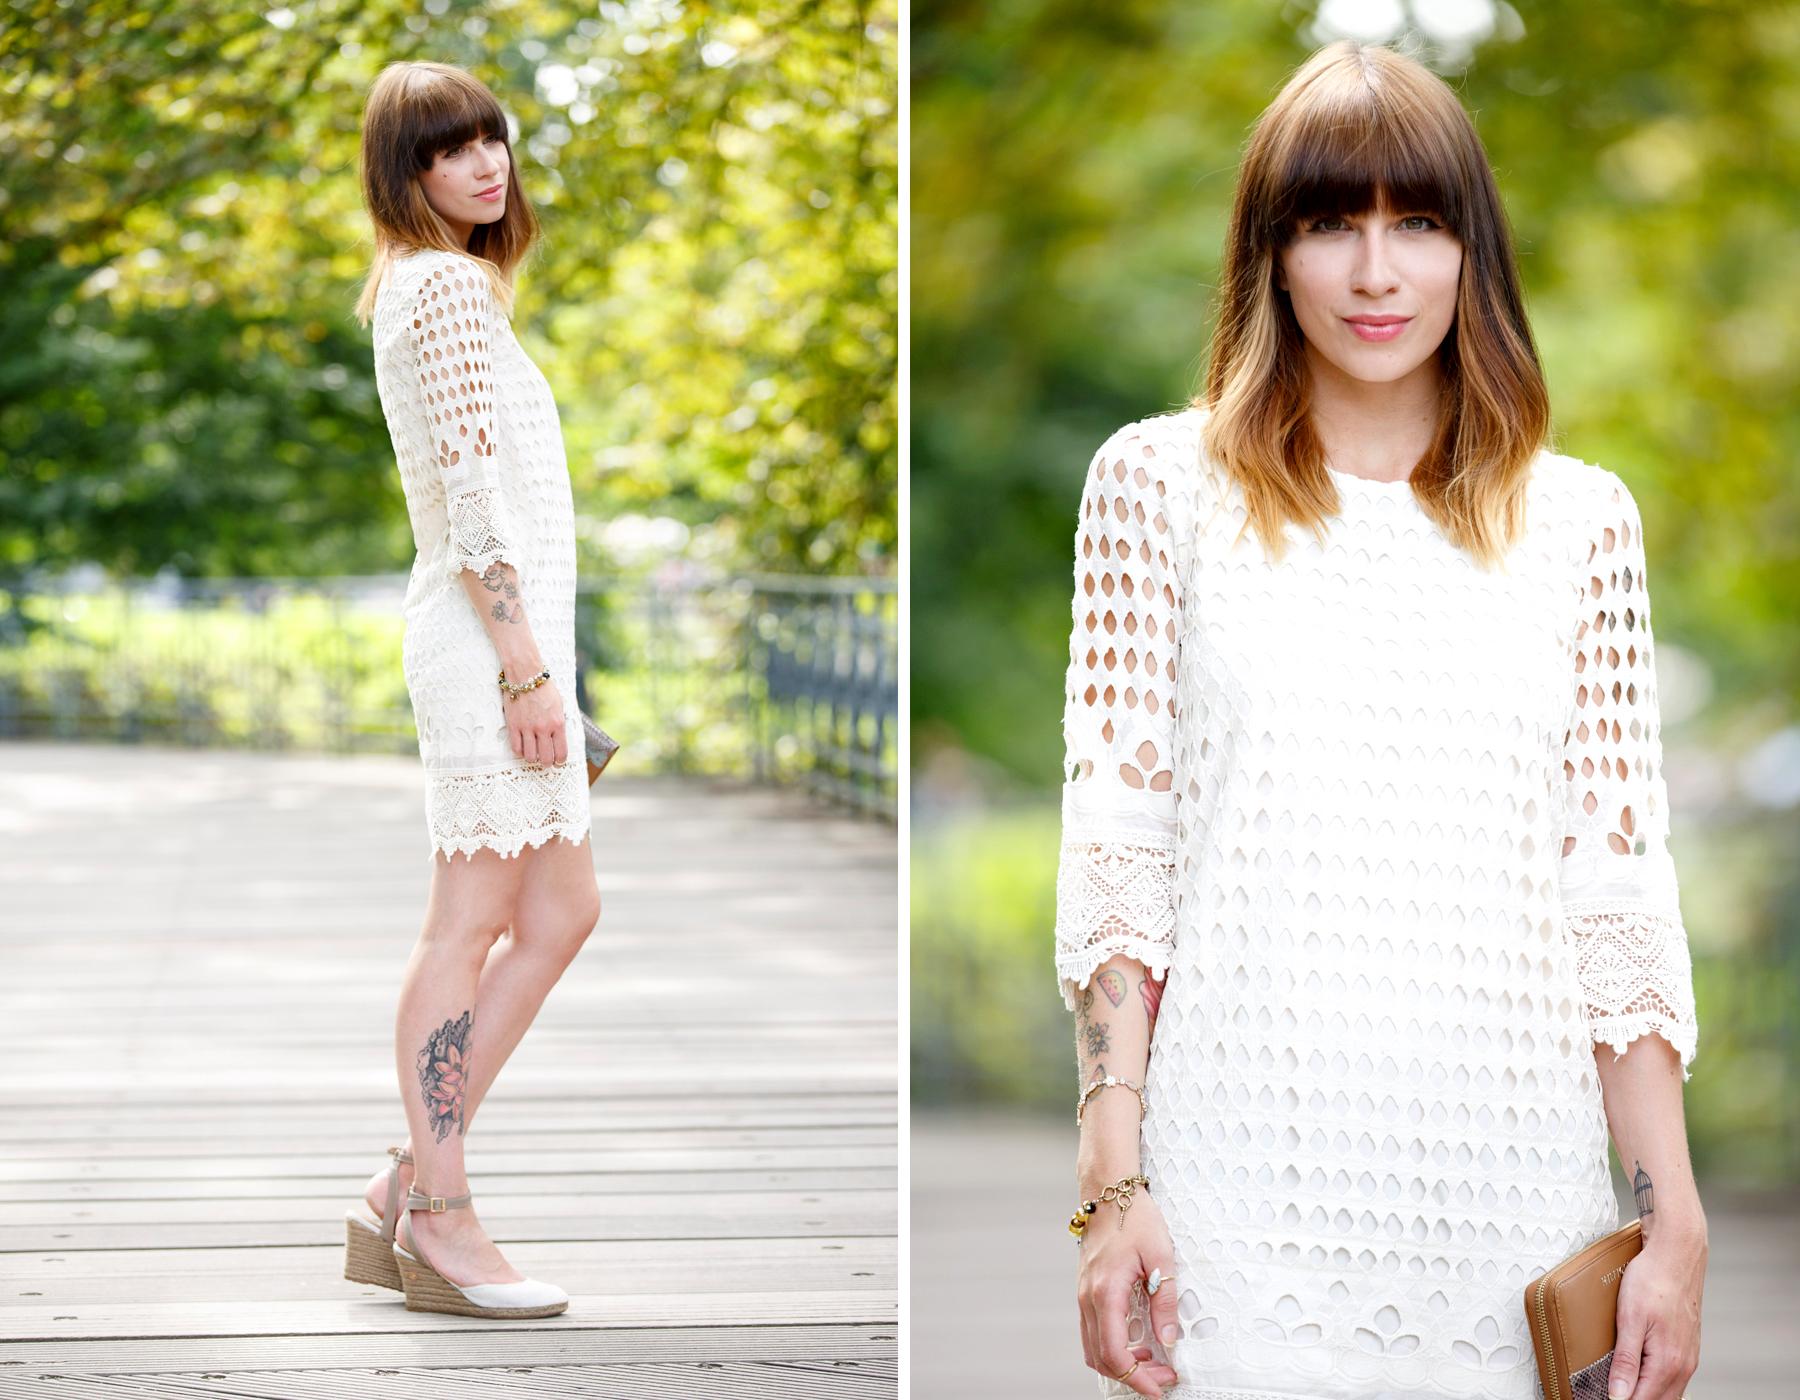 dress-for-less outfit styling white sommerkleid summer look crochet wrangler hilfiger fashion blog germany düsseldorf ricarda schernus cats & dogs 5